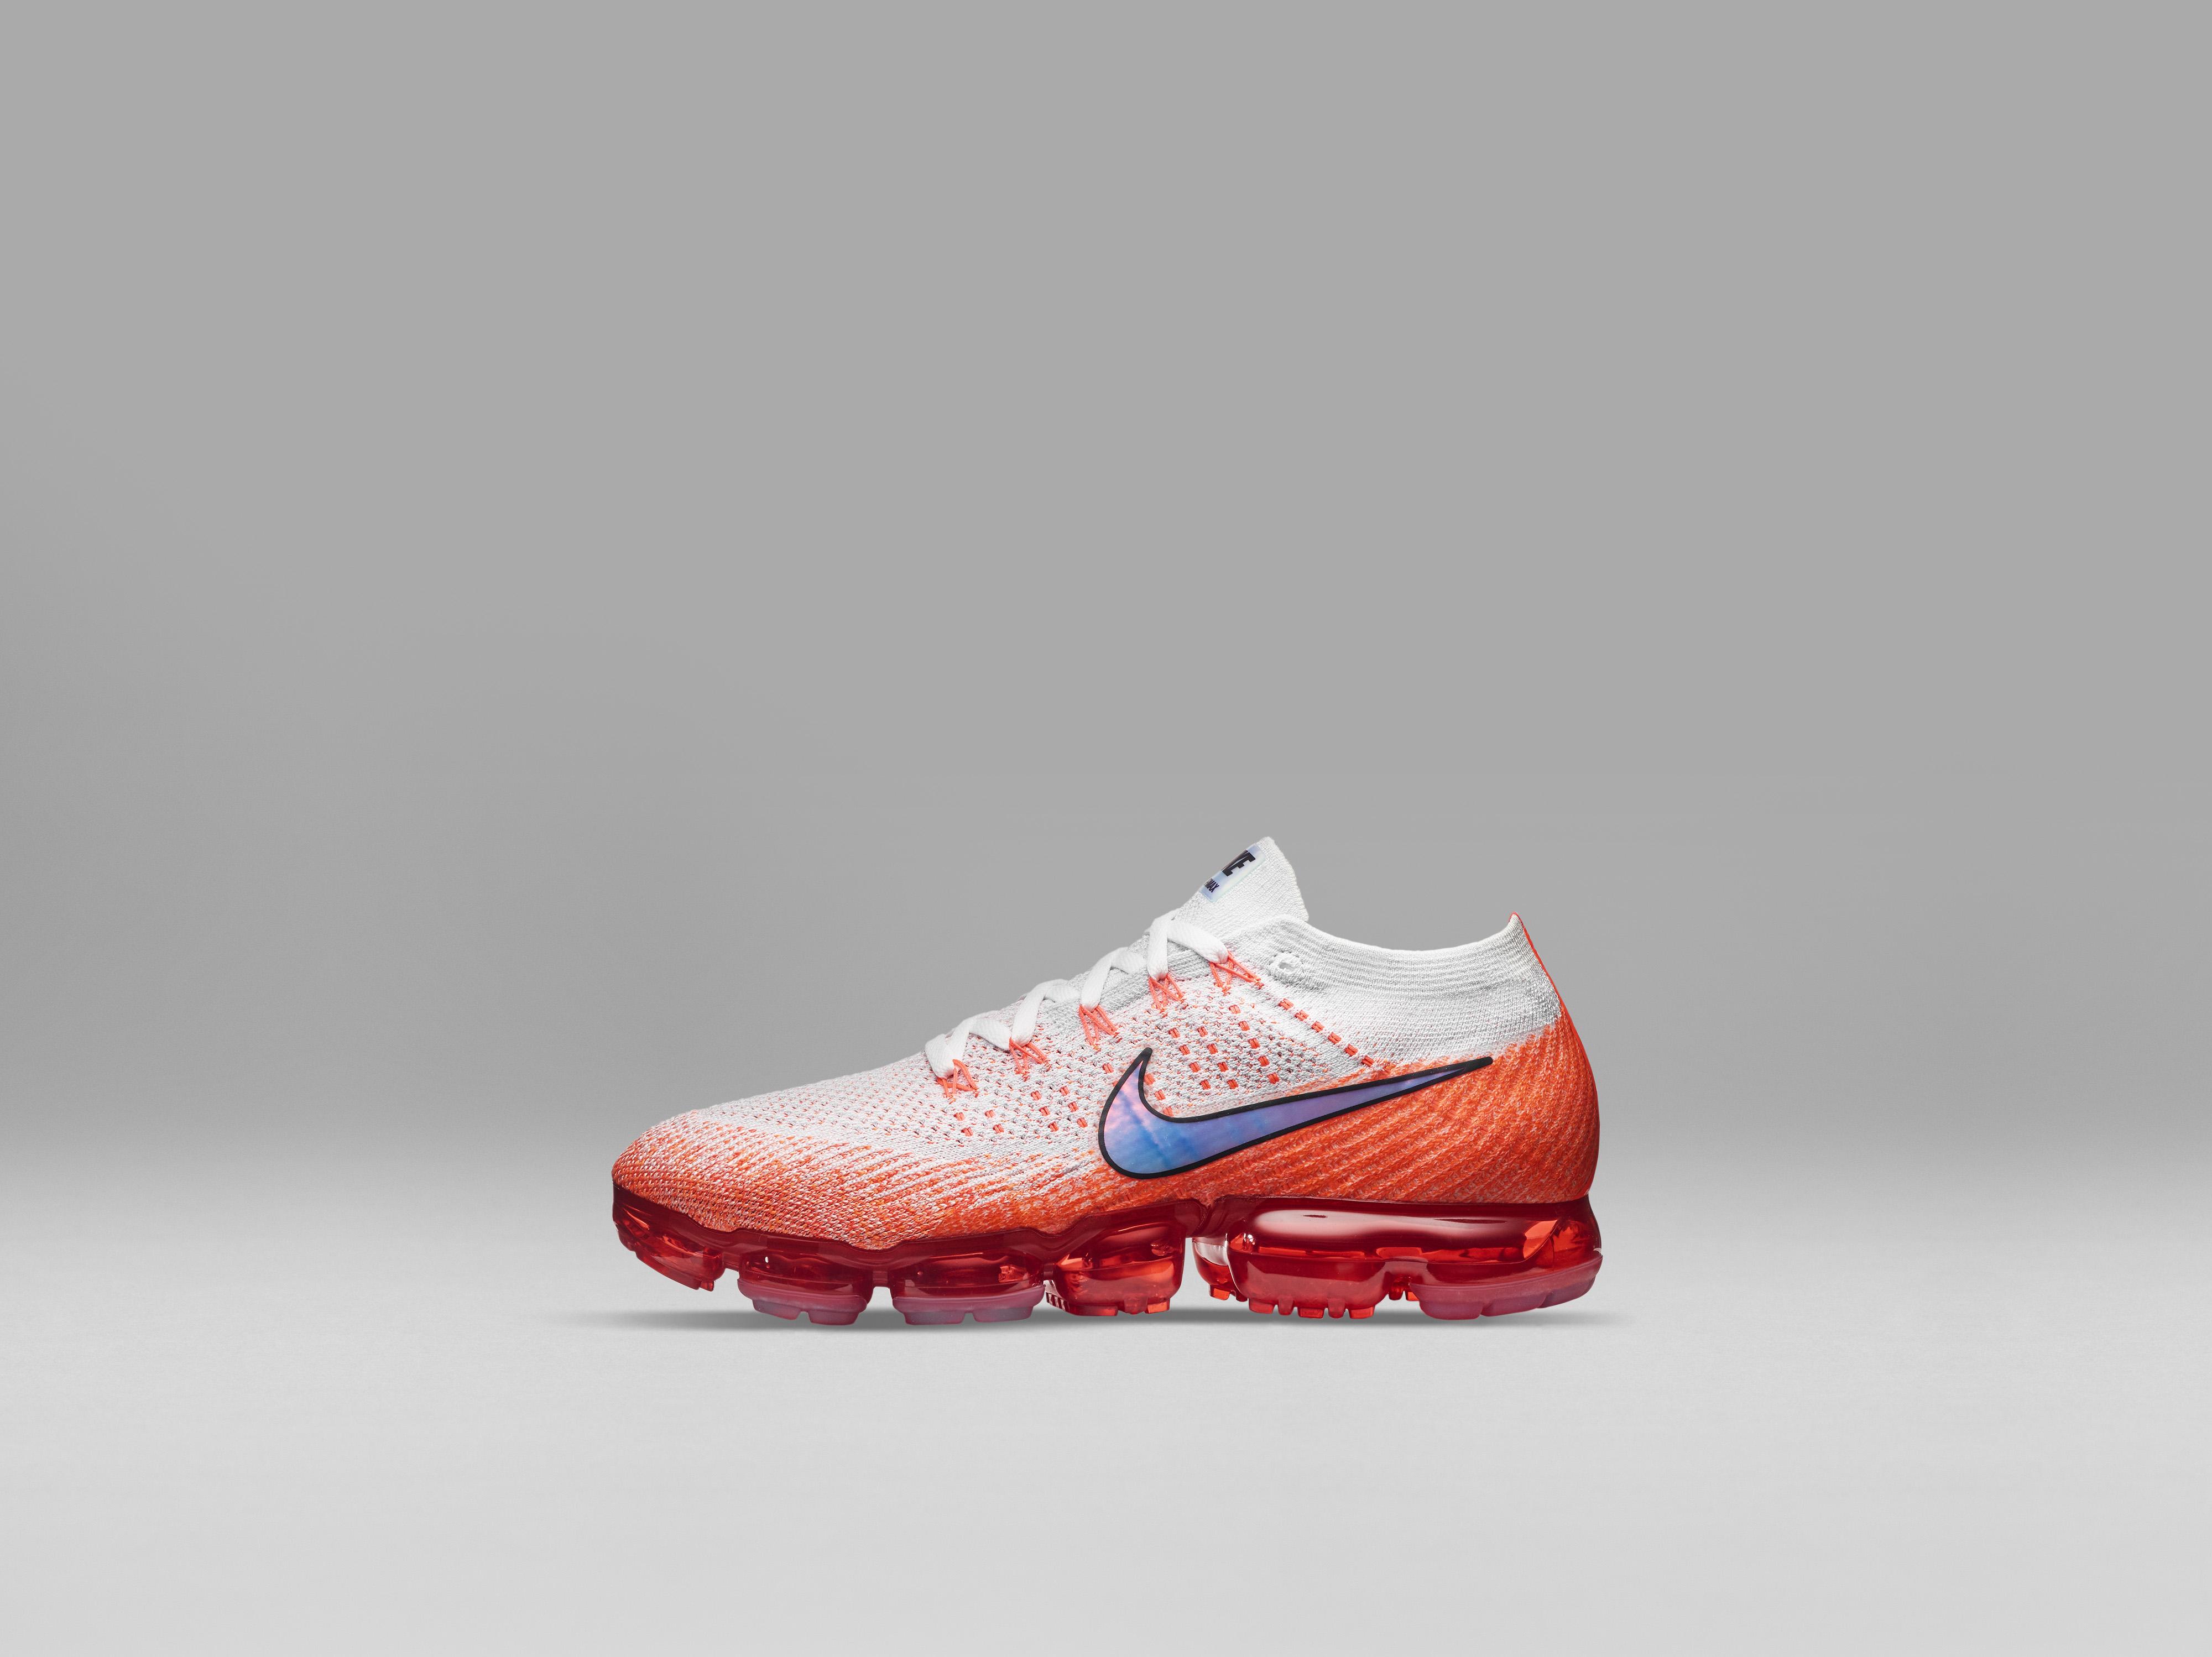 The Nike Air VaporMax